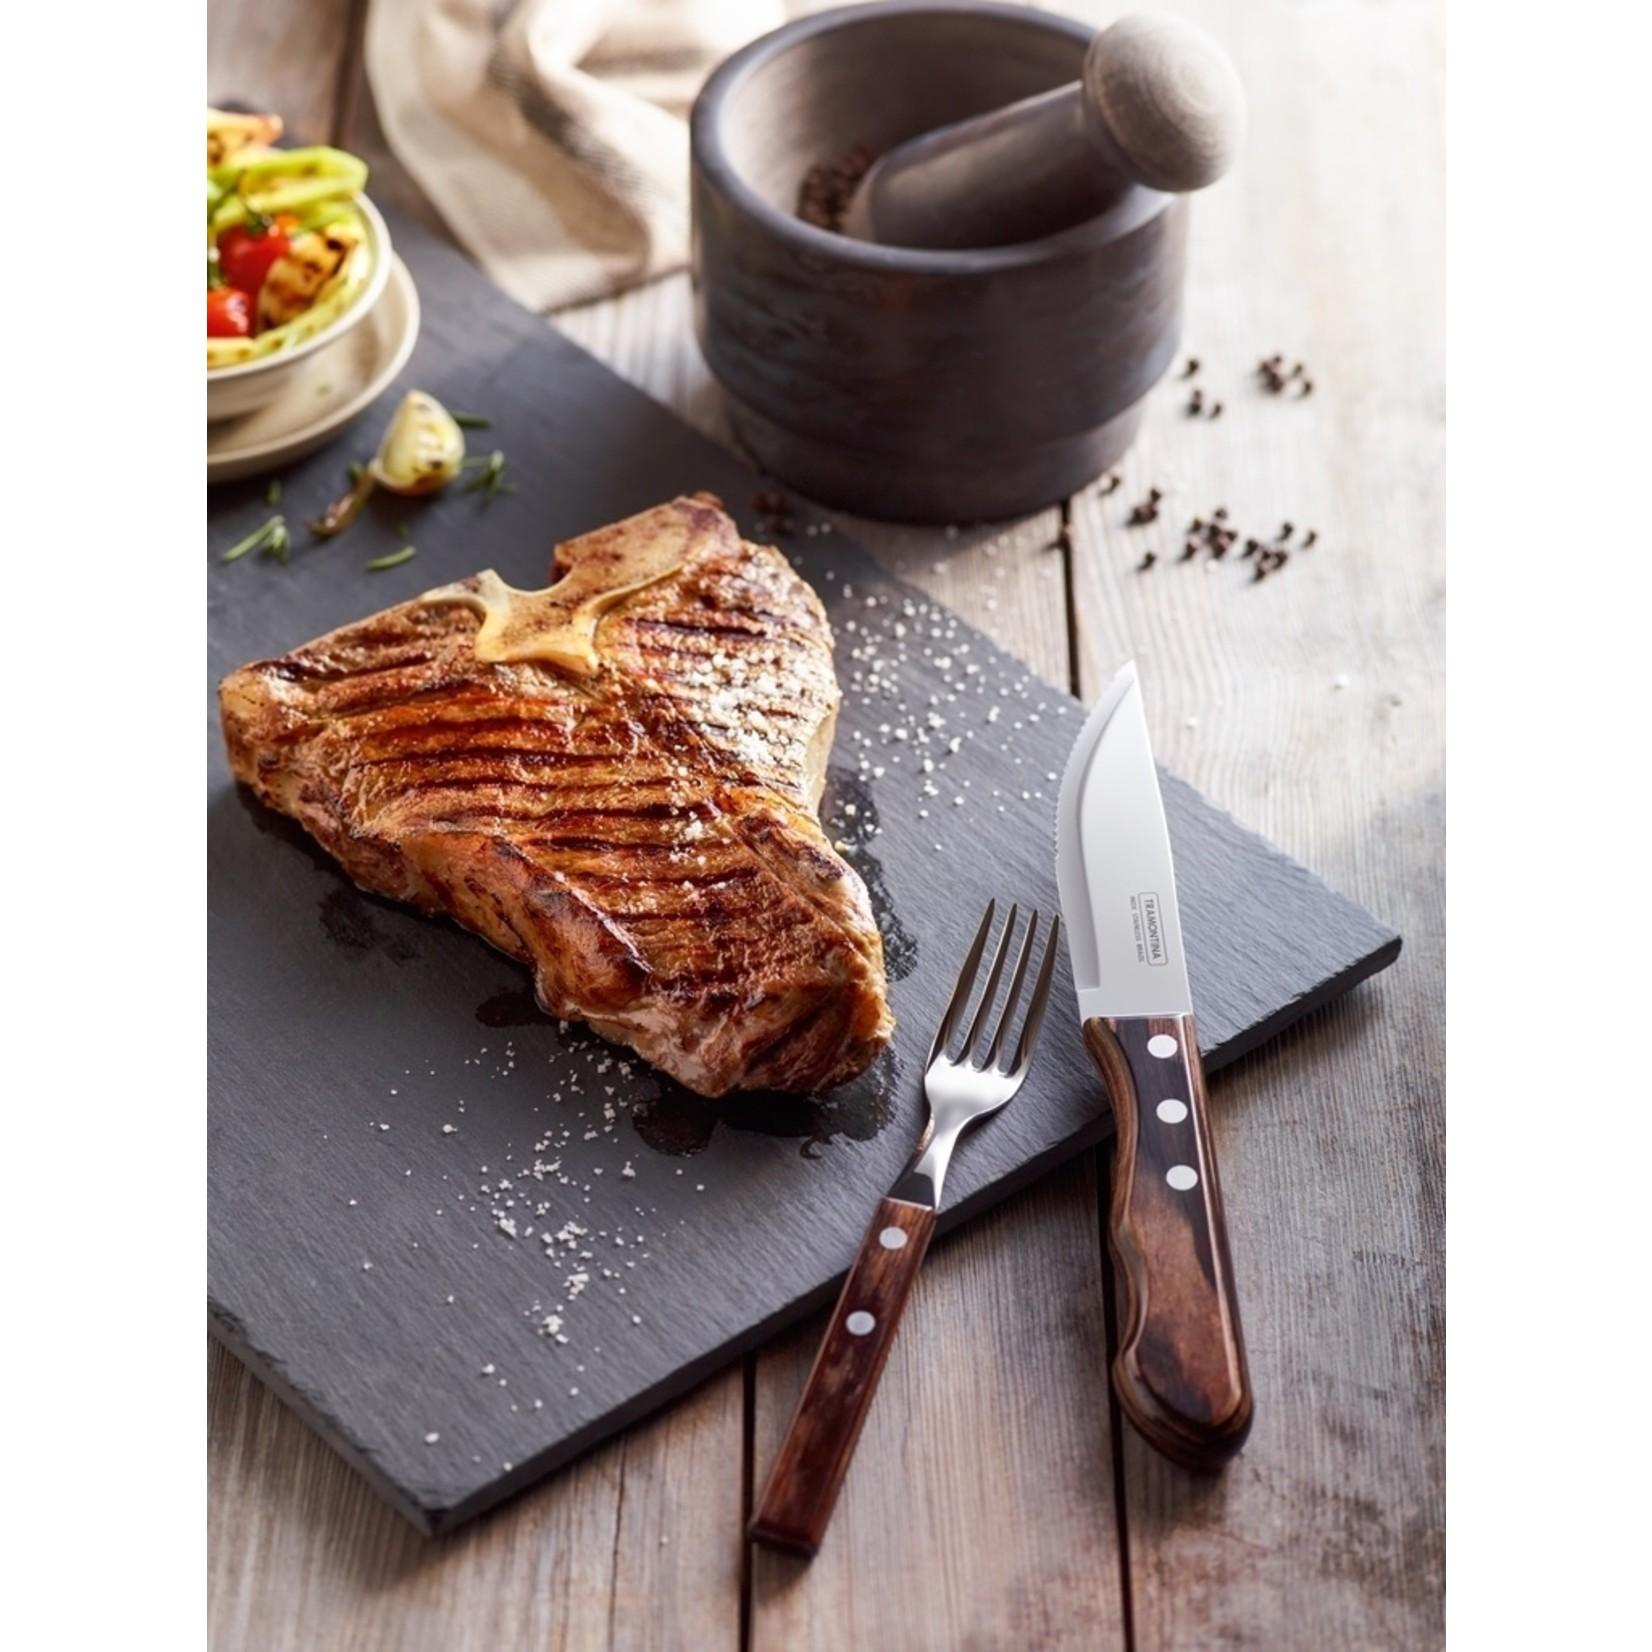 Tramontina Tramontina Churrasco steakmessenset Jumbo 6-delig bruin